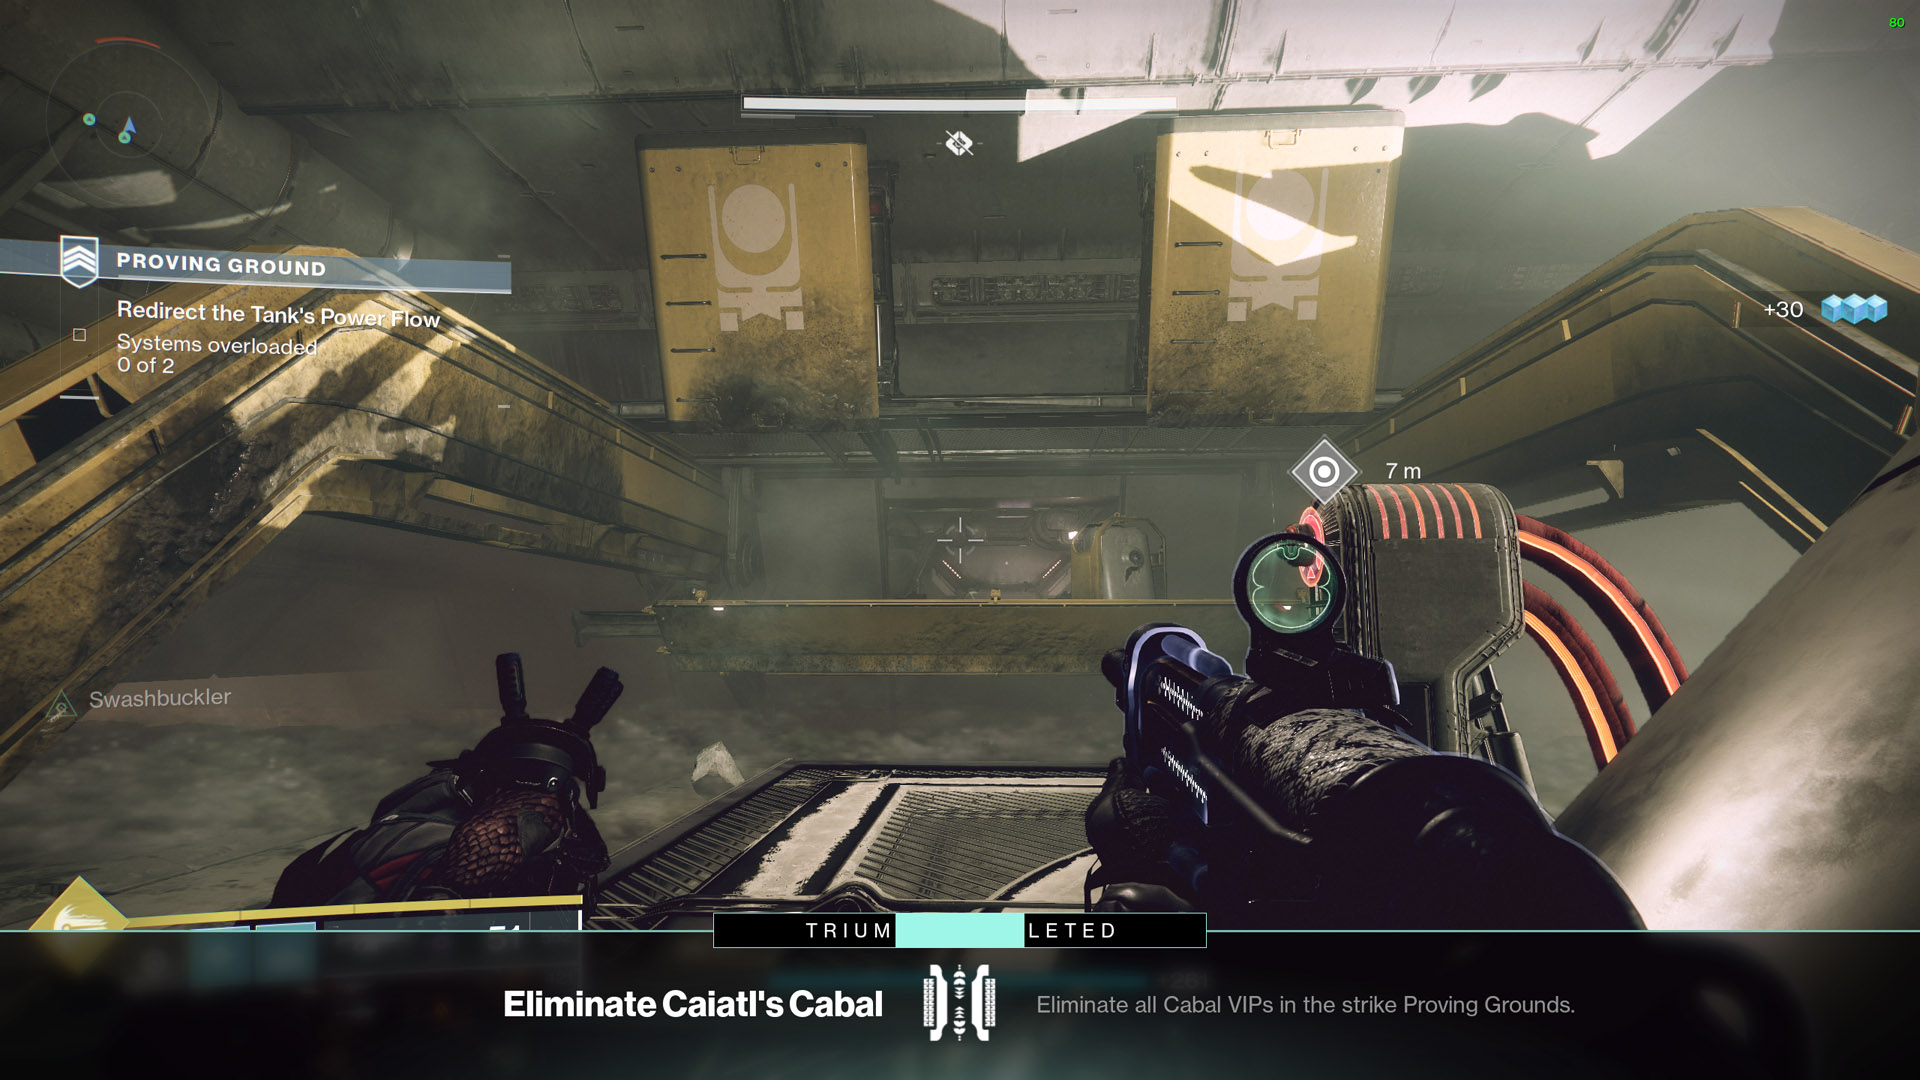 destiny 2 eliminate caiatl's cabal